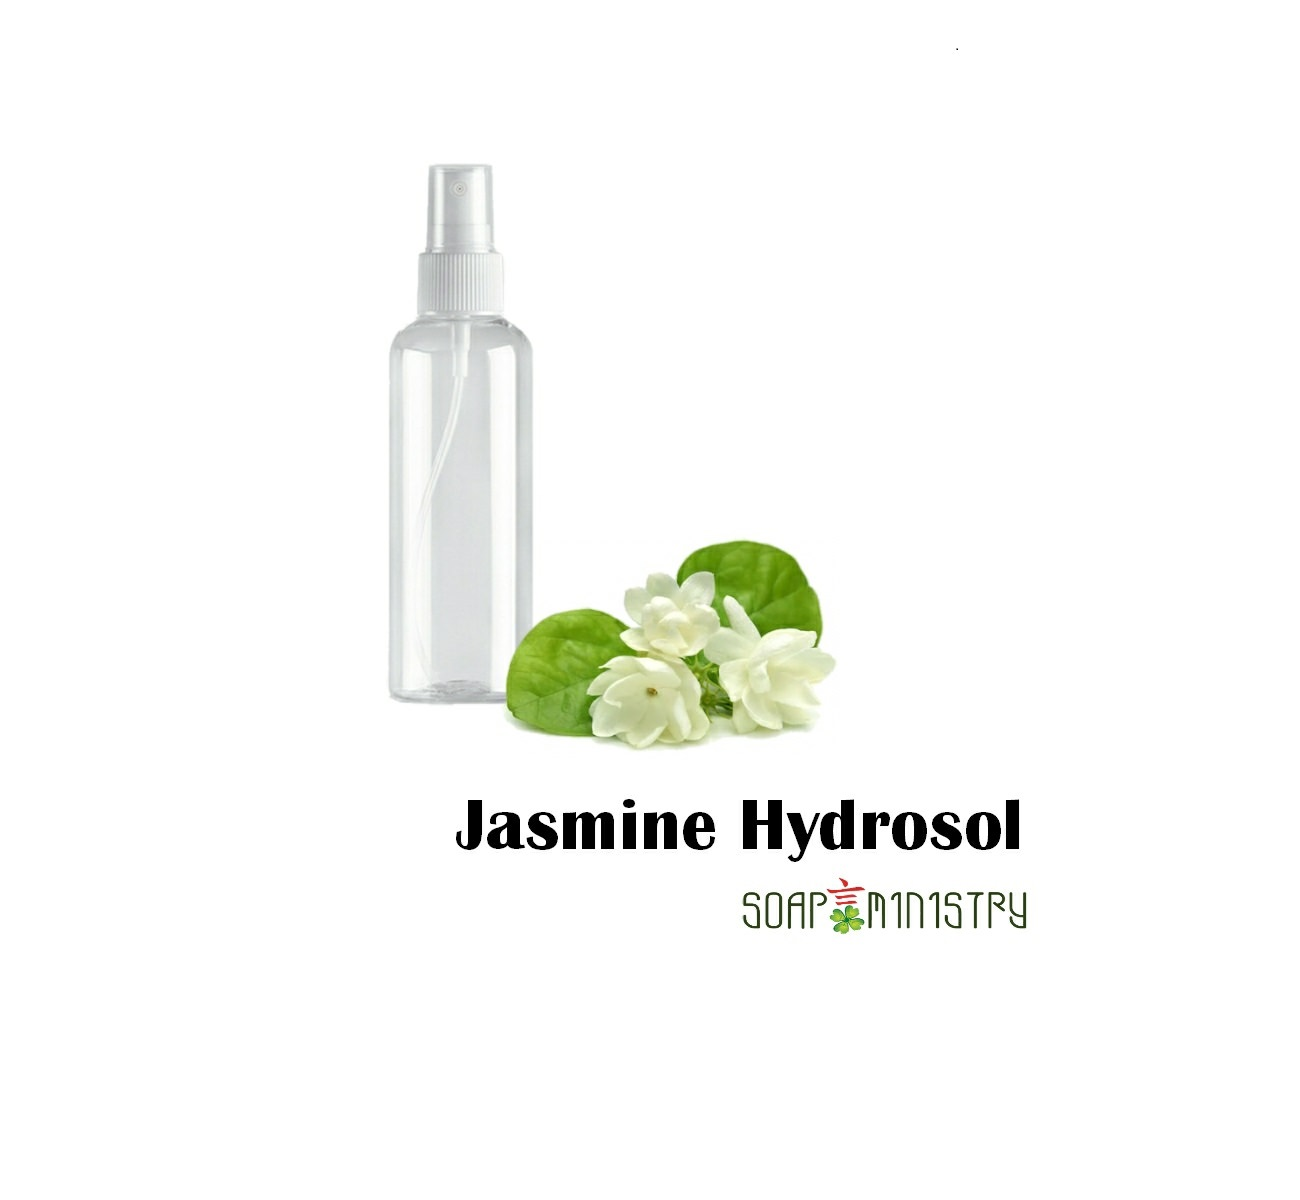 Jasmine Hydrosol 1L